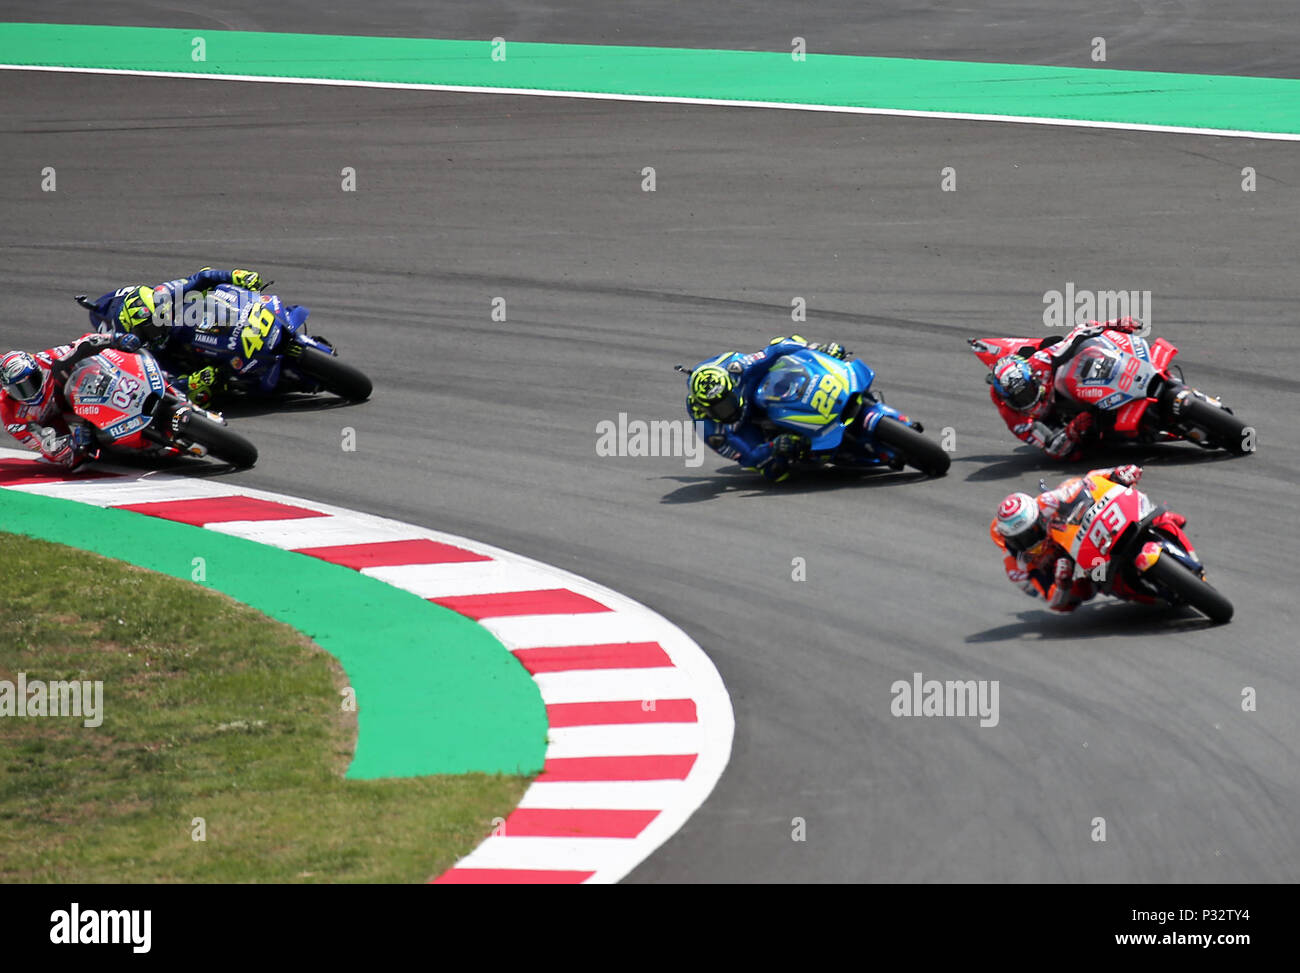 Barcelona -17th June 2018- SPAIN: start of the  the GP Catalunya Moto GP, in the Barcelona-Catalunya Circuit, on 17th June 2018. Photo: Joan Valls/Urbanandsport/Cordon Press - Stock Image